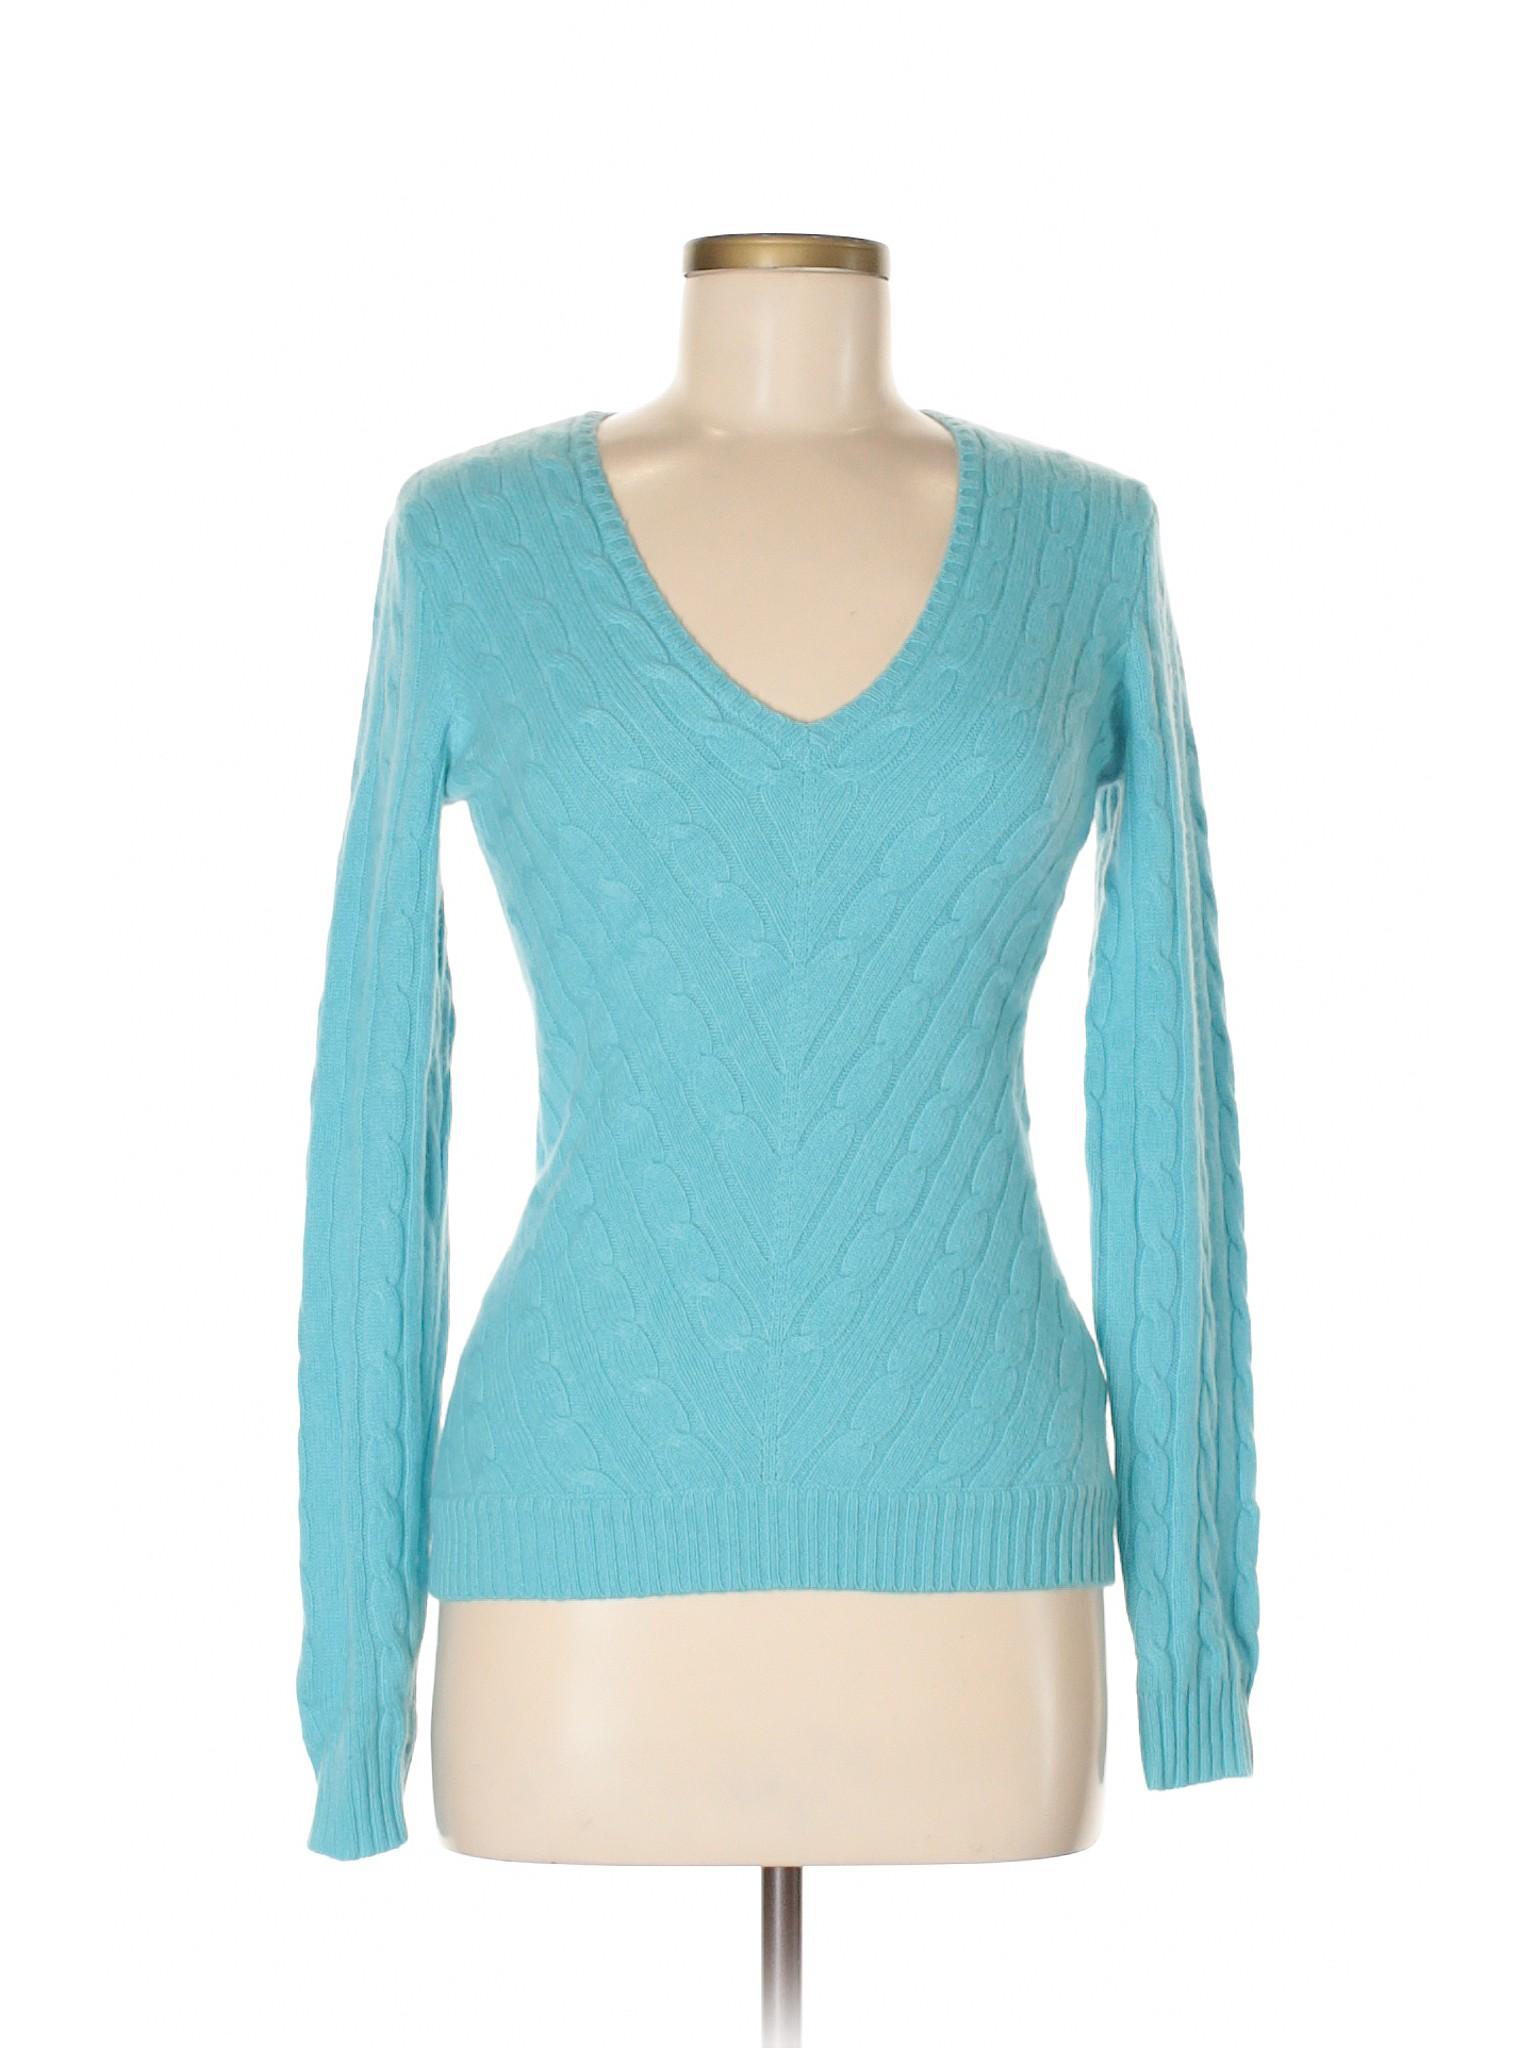 winter Boutique Lauren Cashmere Sweater Black Label Ralph Pullover AqaqwPdU